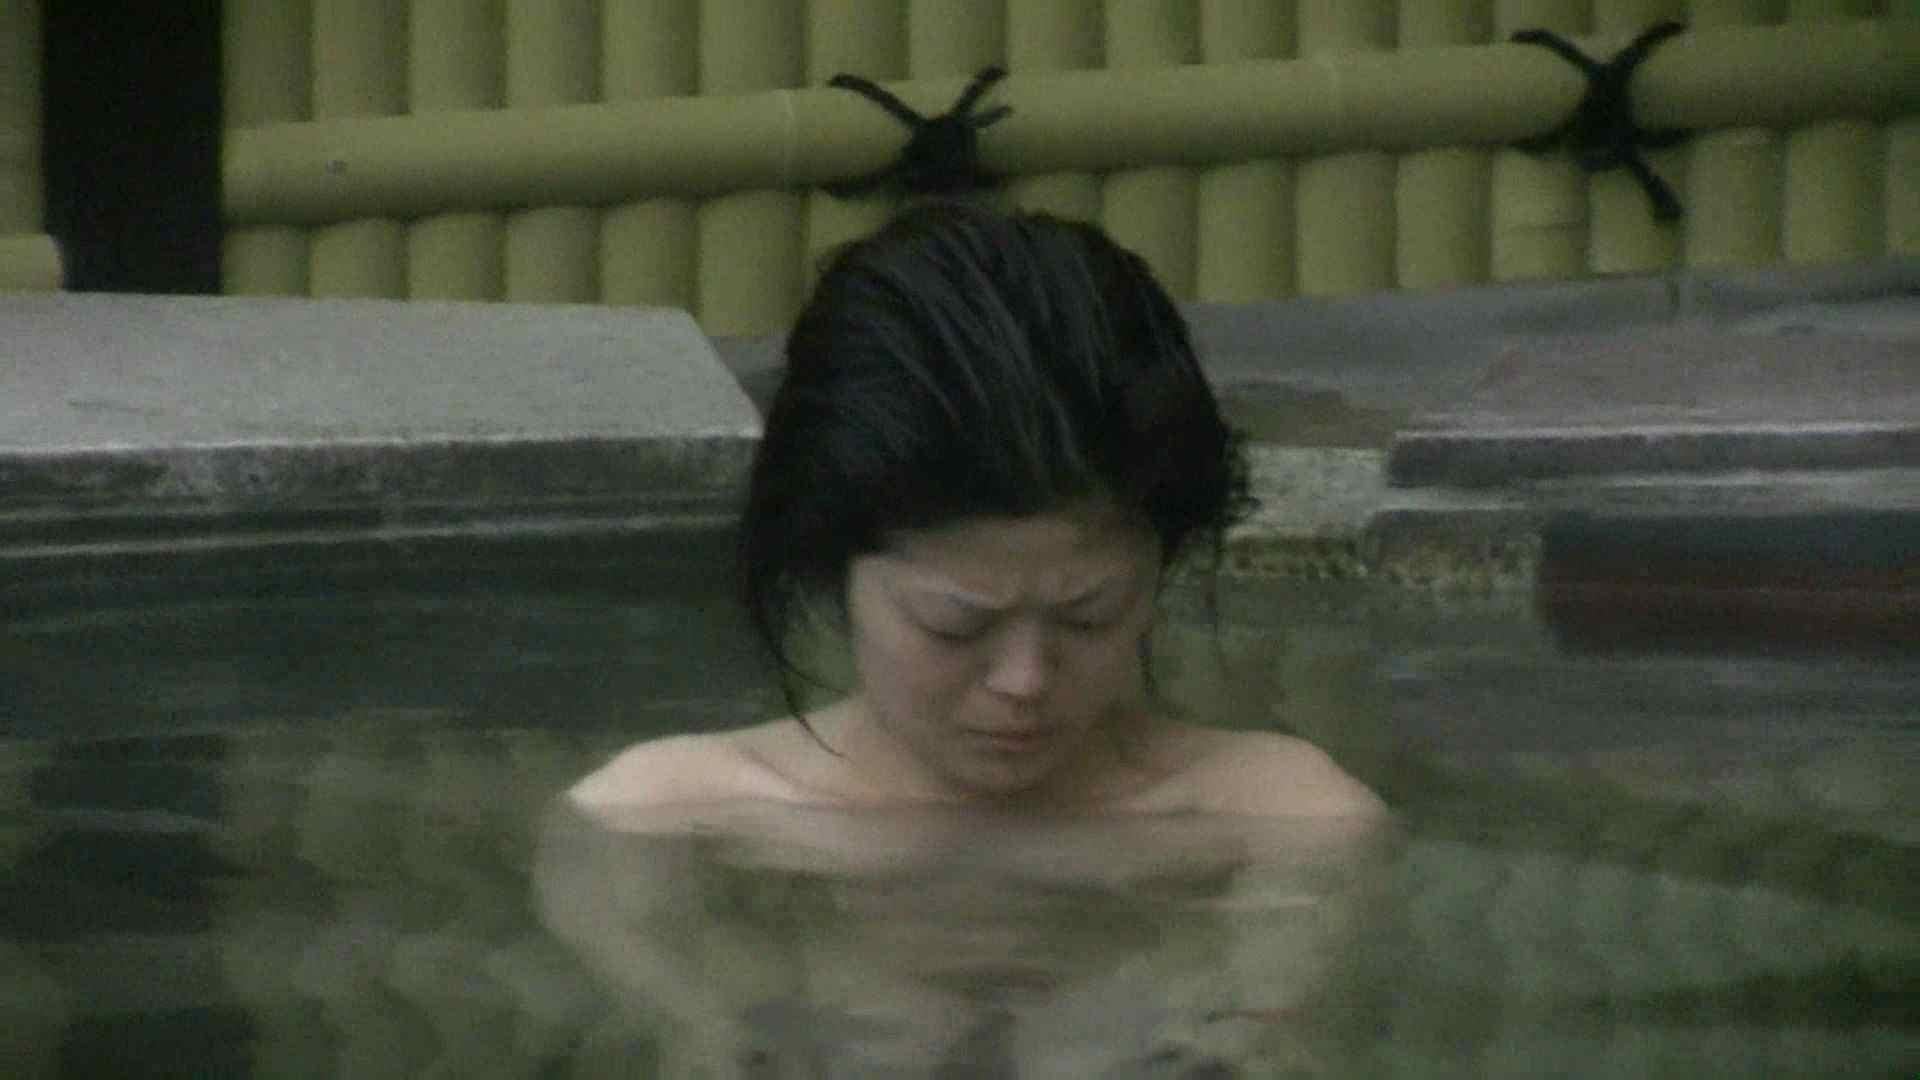 Aquaな露天風呂Vol.538 盗撮師作品 おめこ無修正動画無料 82pic 59